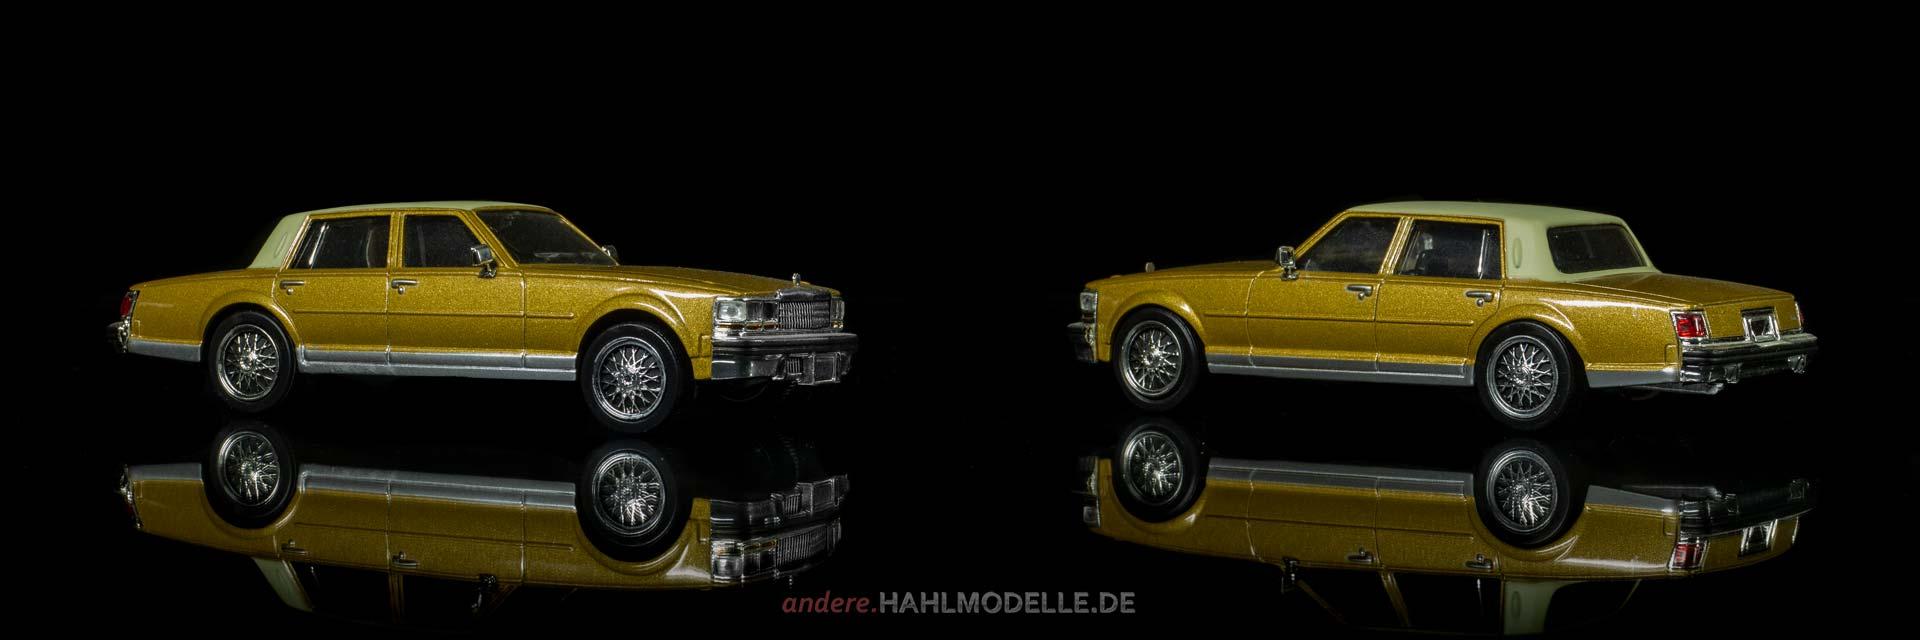 Cadillac Seville | Limousine | Ixo (Del Prado Car Collection) | 1:43 | www.andere.hahlmodelle.de